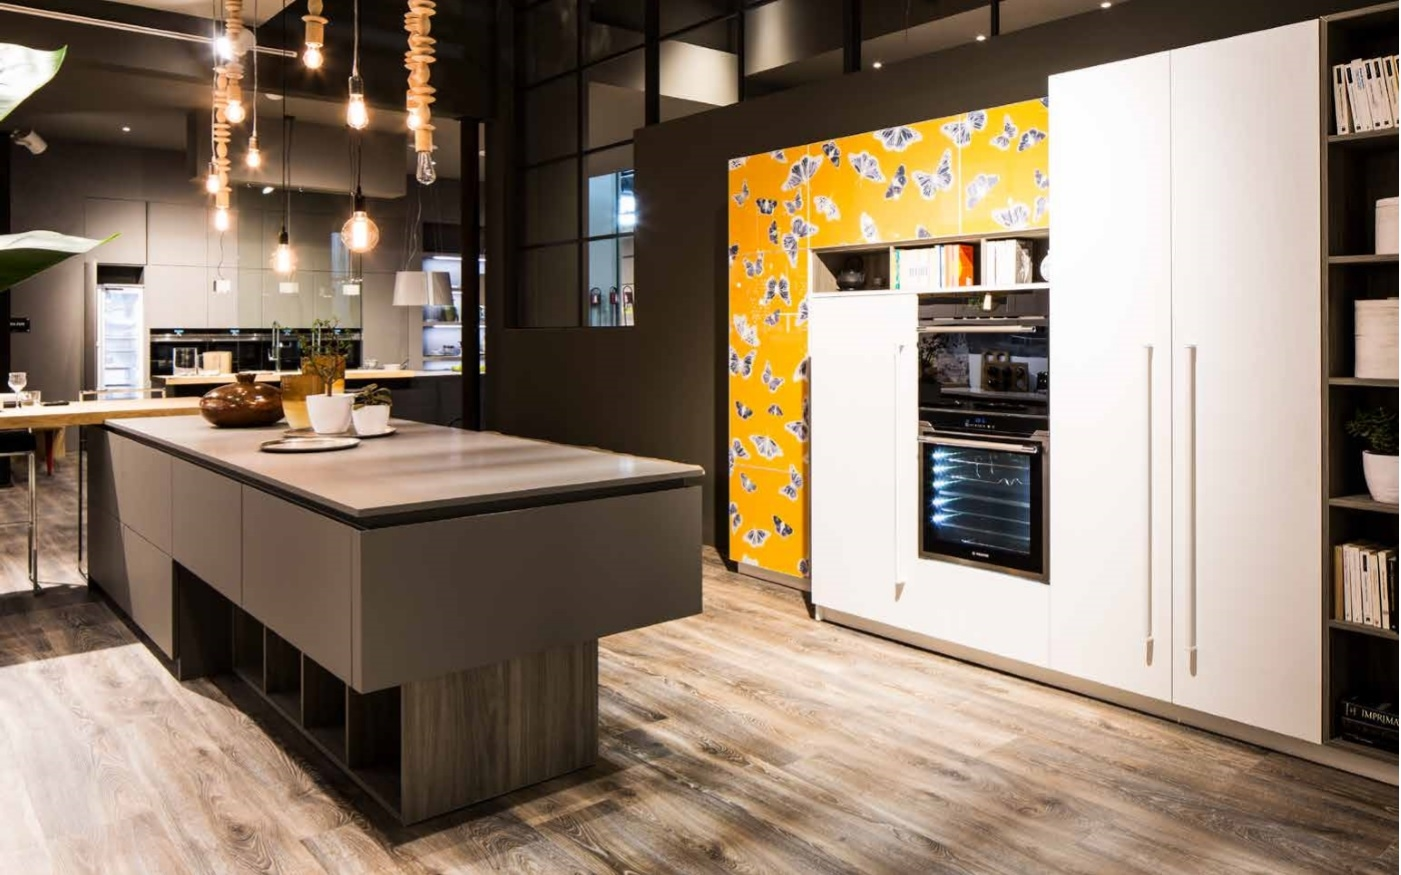 Cucina con isola arrex cucine scontata del 50 cucine a - Cucine arrex qualita ...